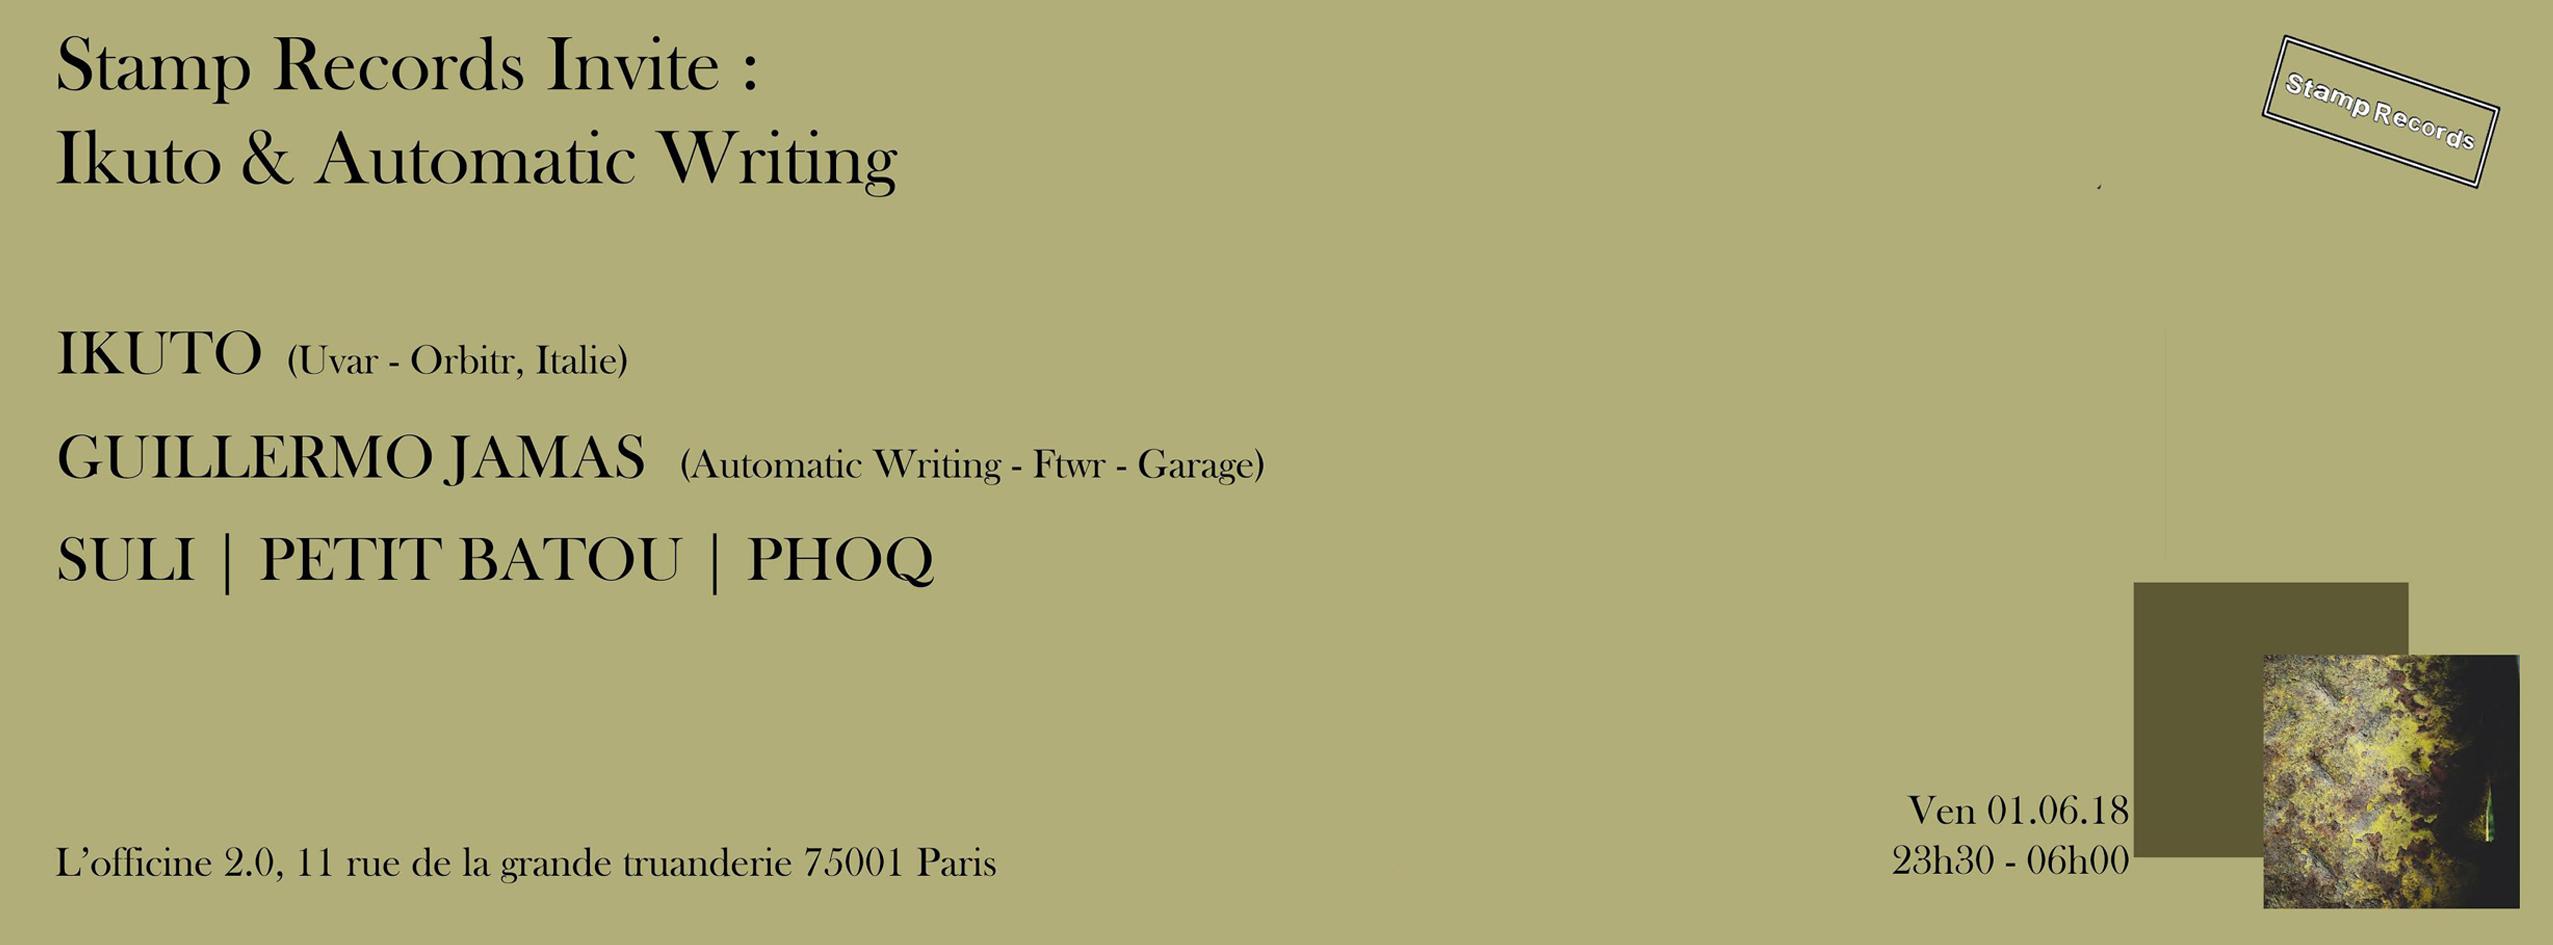 Stamp Records Invite : Ikuto & Automatic Writing